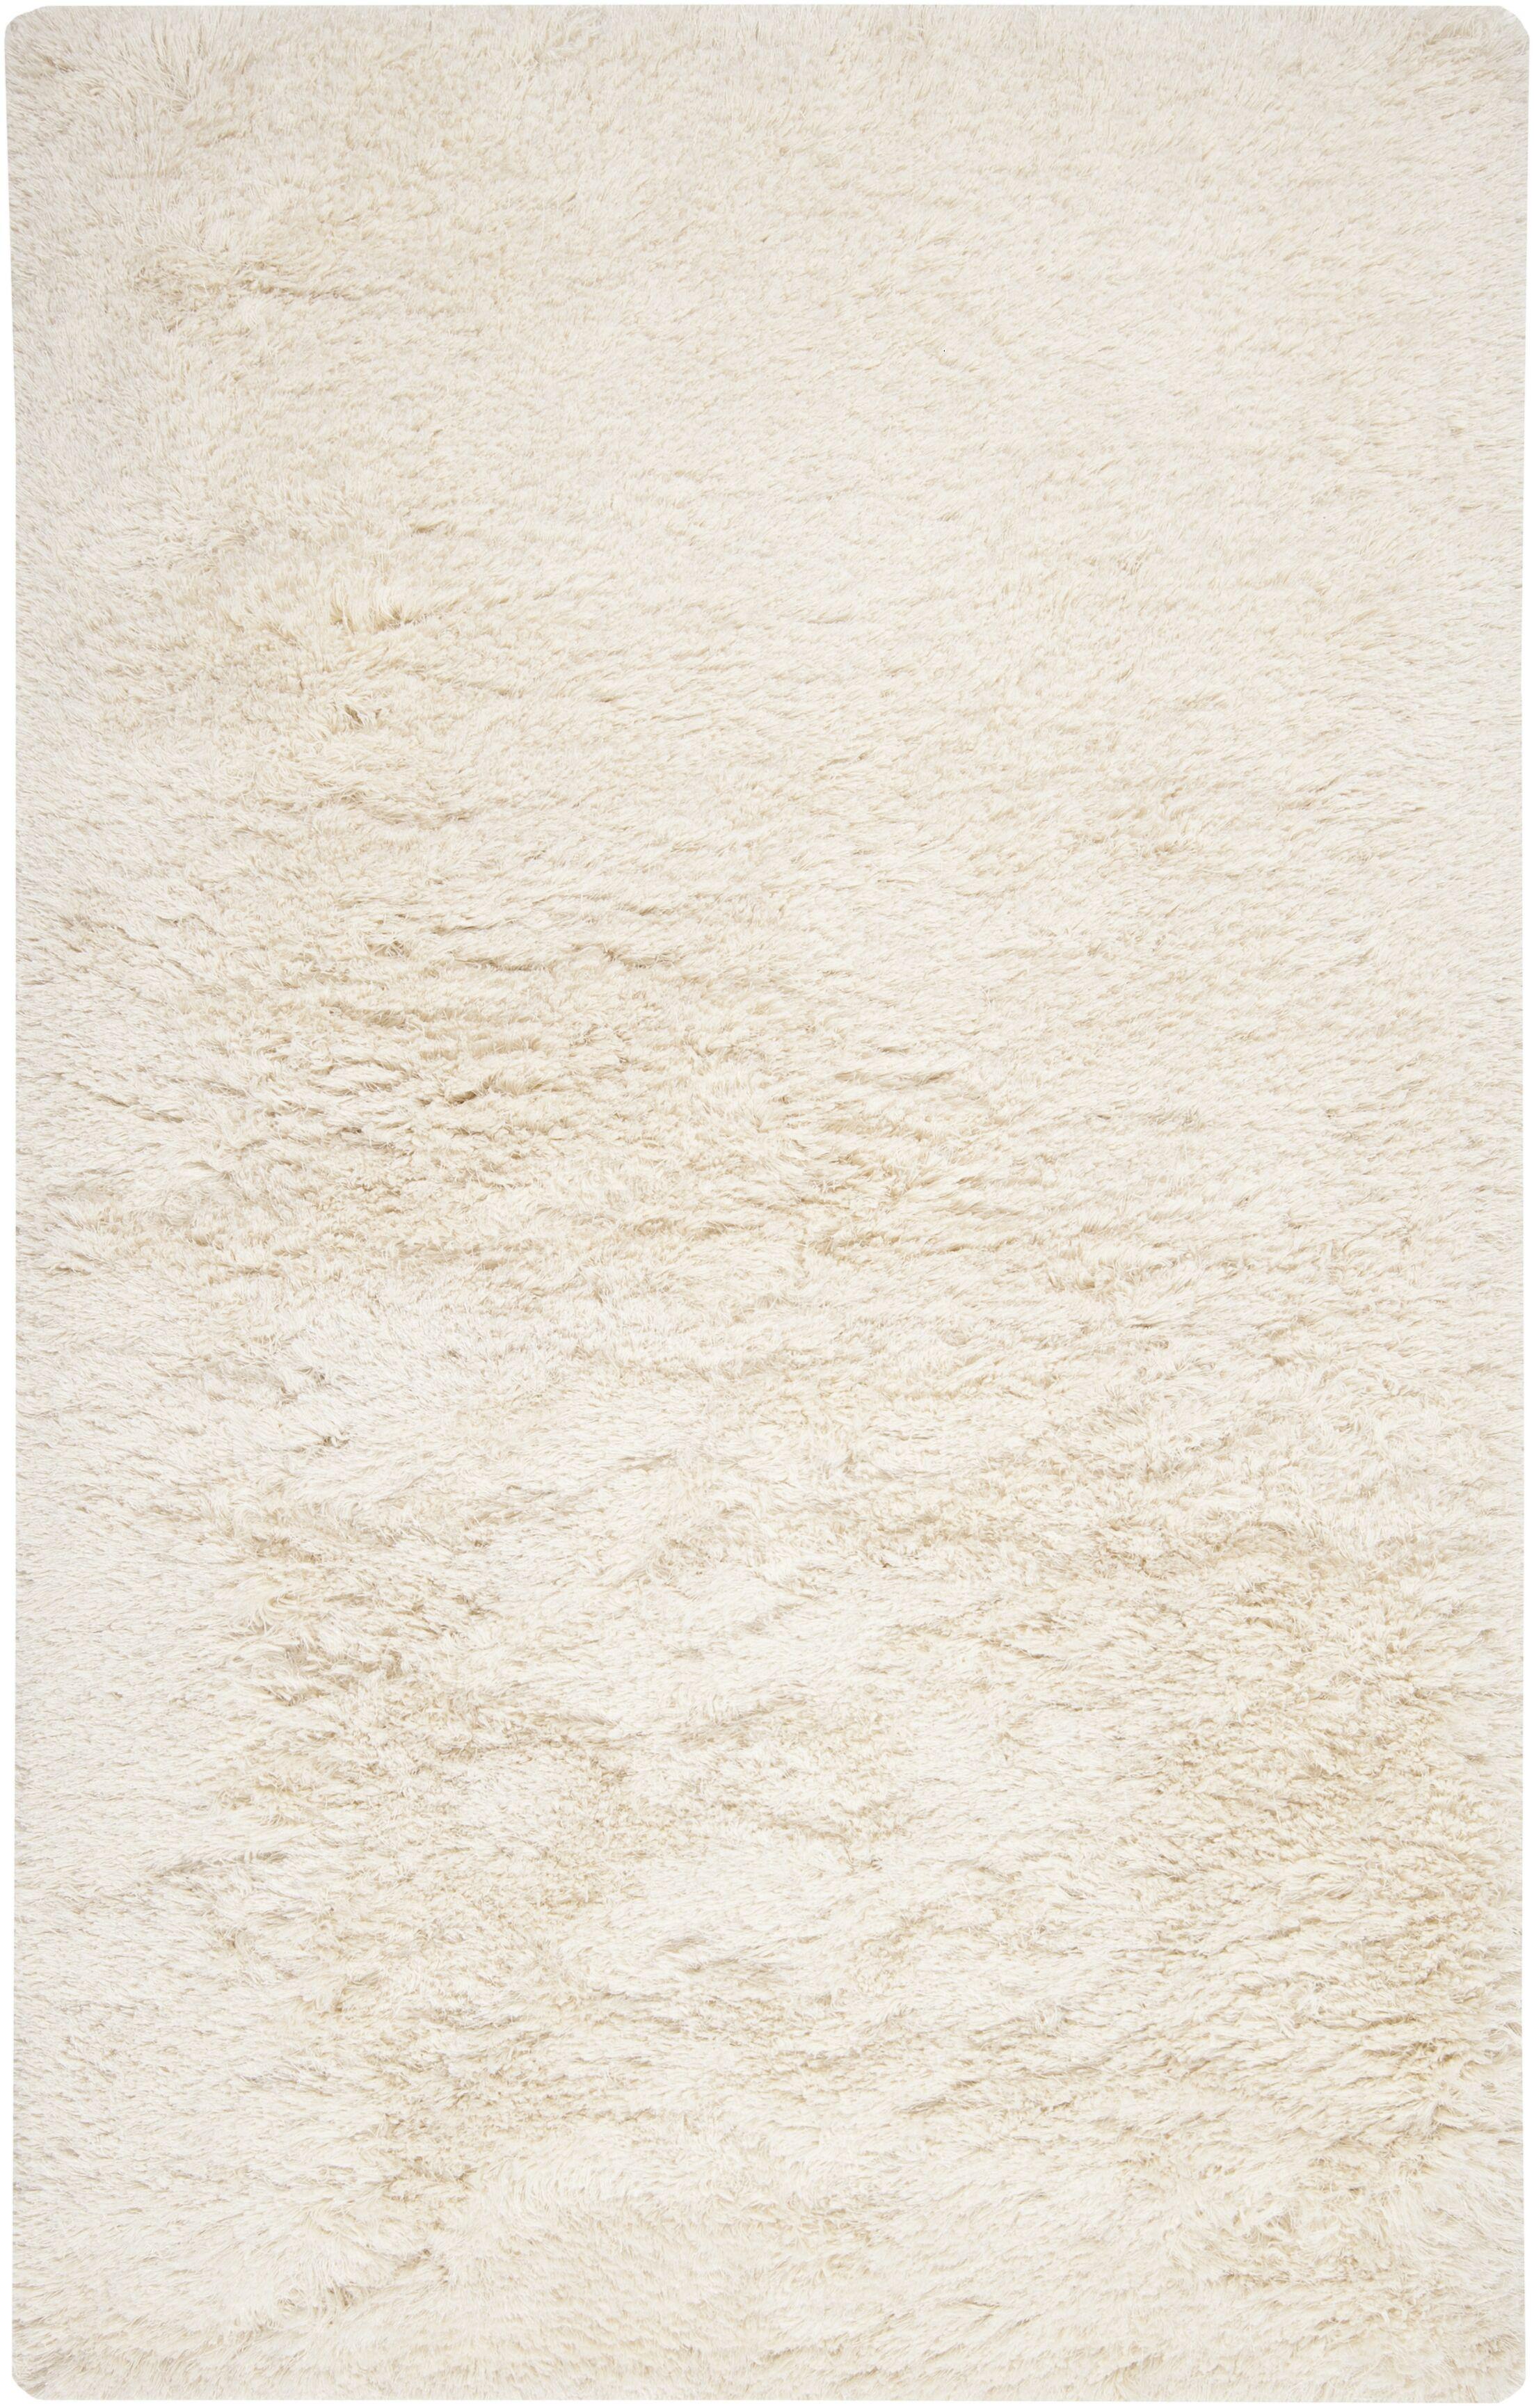 Halpern Hand Woven Wool White Area Rug Rug Size: Rectangle 5' x 8'